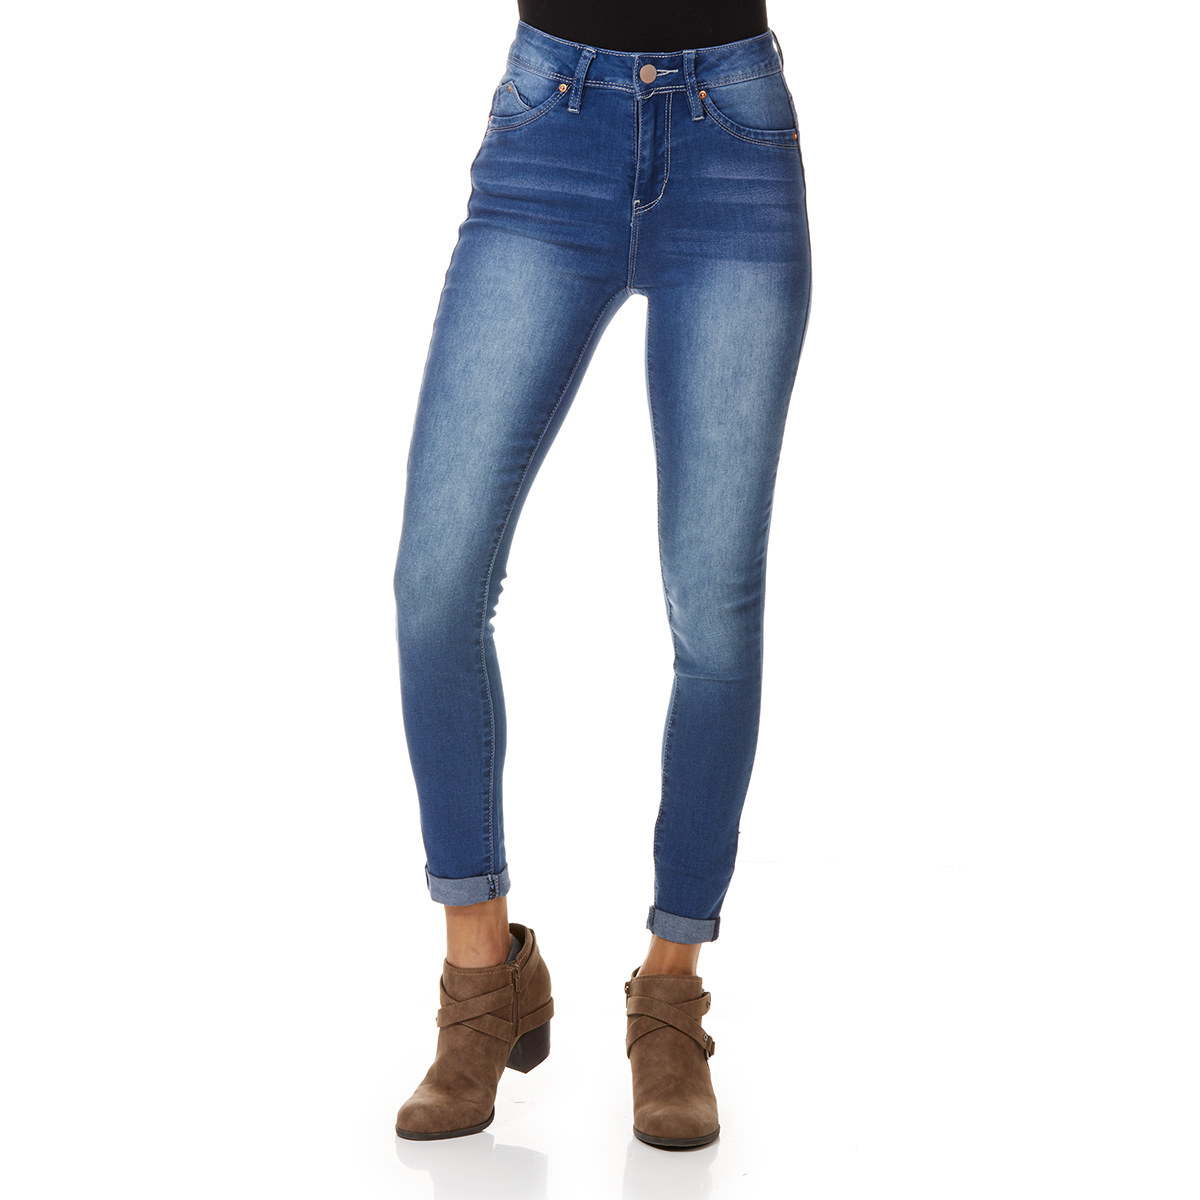 YMI Juniors' Denim Luxe Lift Rolled Cuff Jeans - Blue, 13